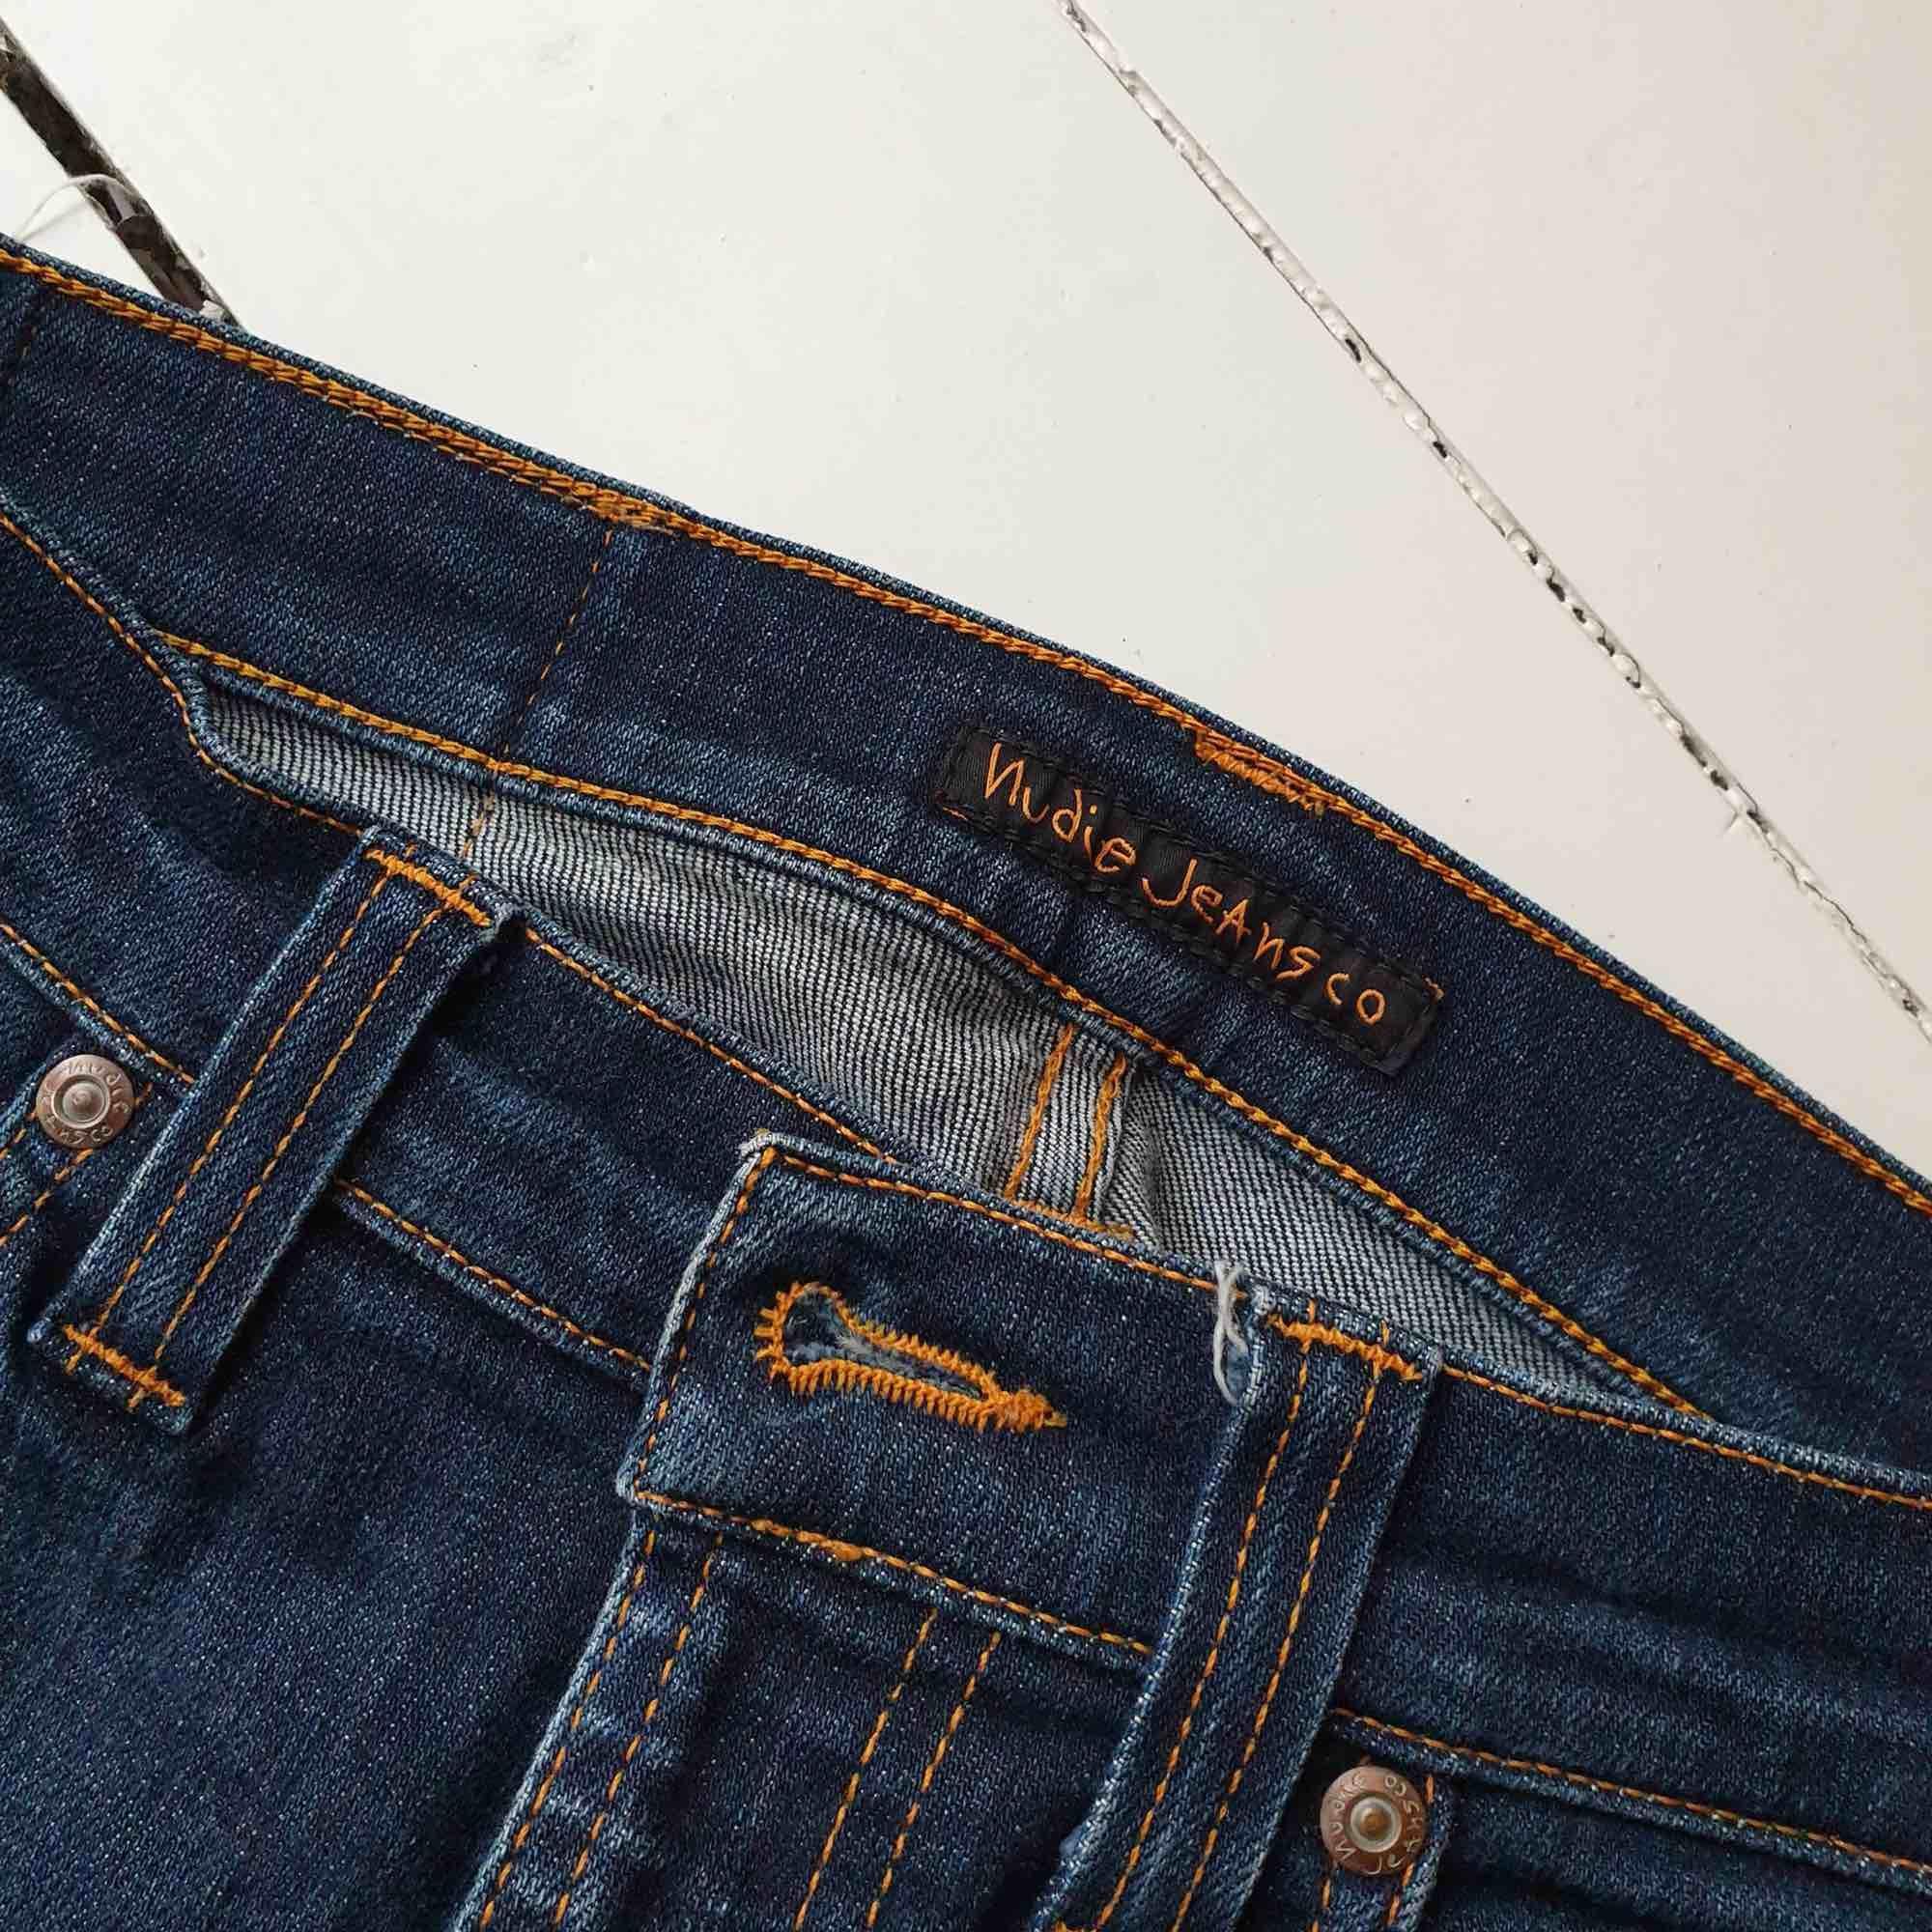 Snygga, mörkblå jeans i bra skick. Märke: Nudie Jeans Co Storlek: 26 32 Material: denim Pris: 450 kronor inkl.. Jeans & Byxor.